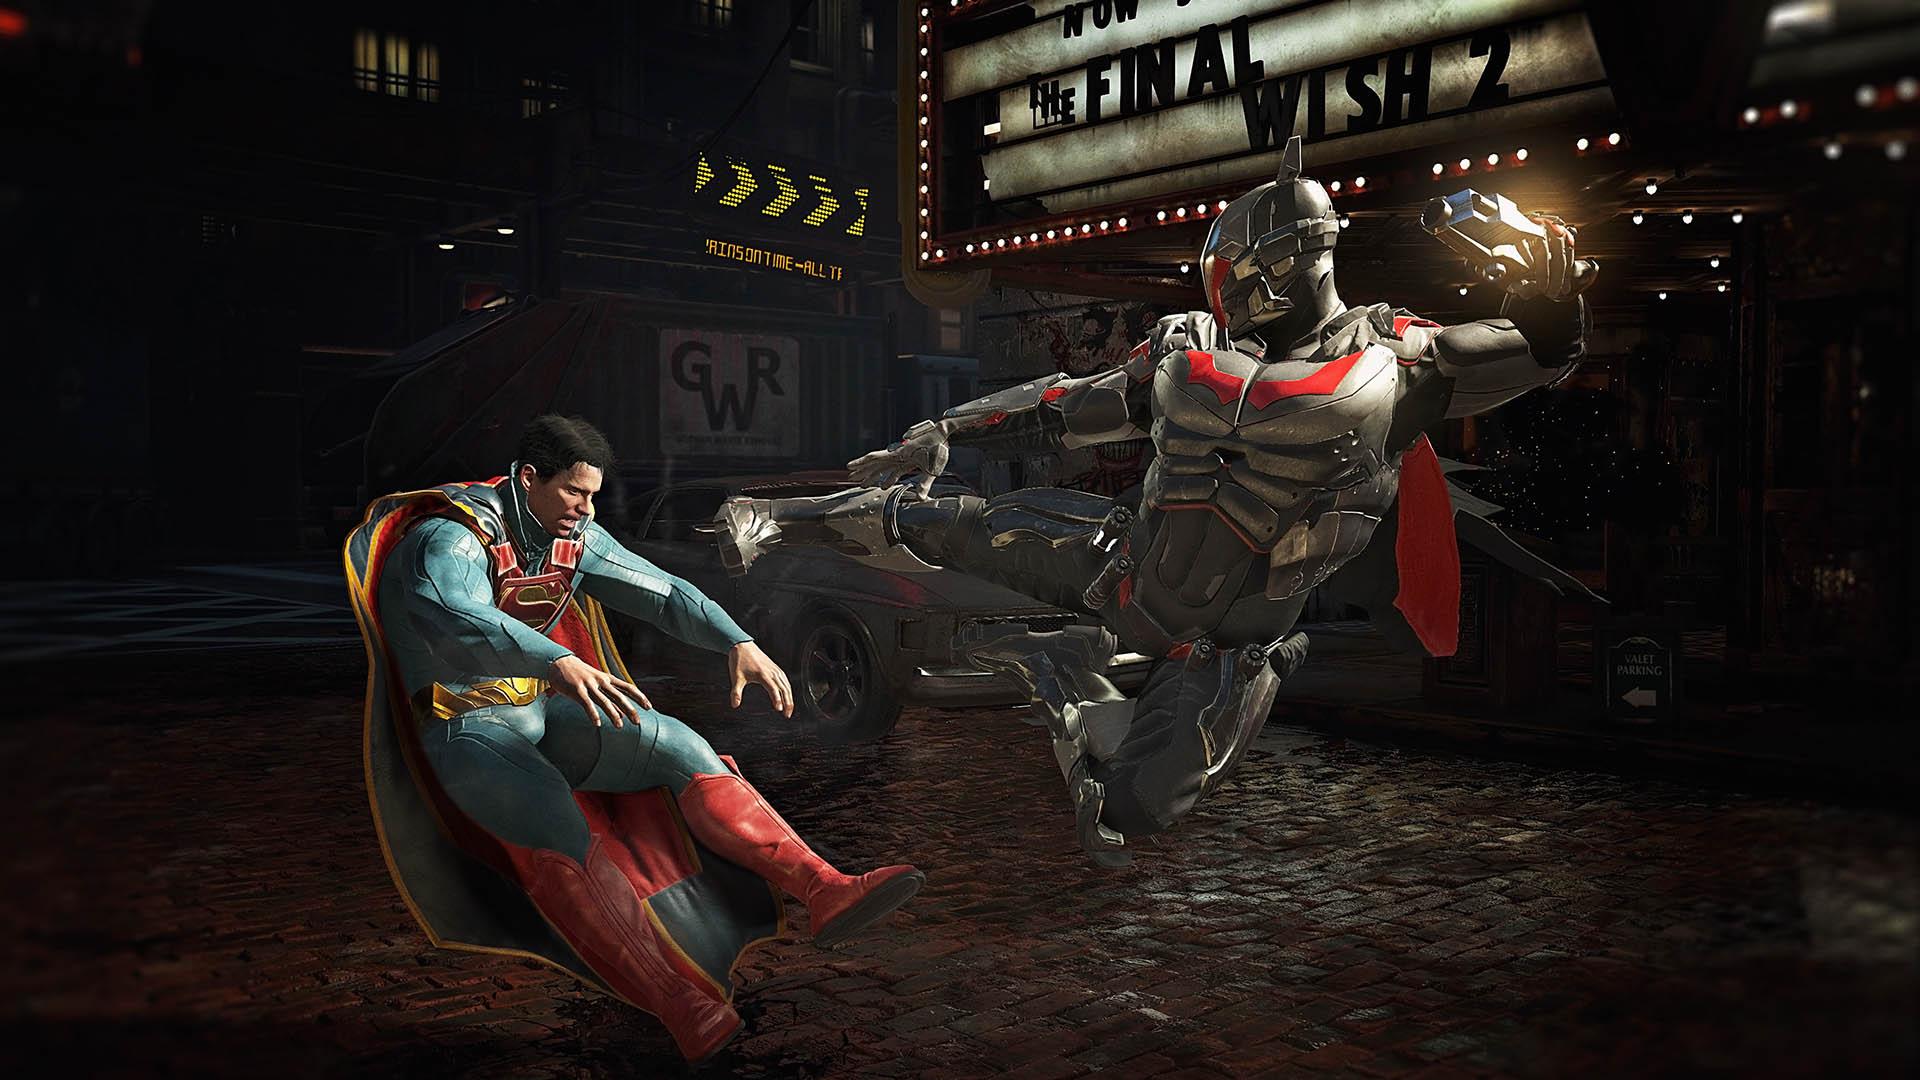 Injustice 9